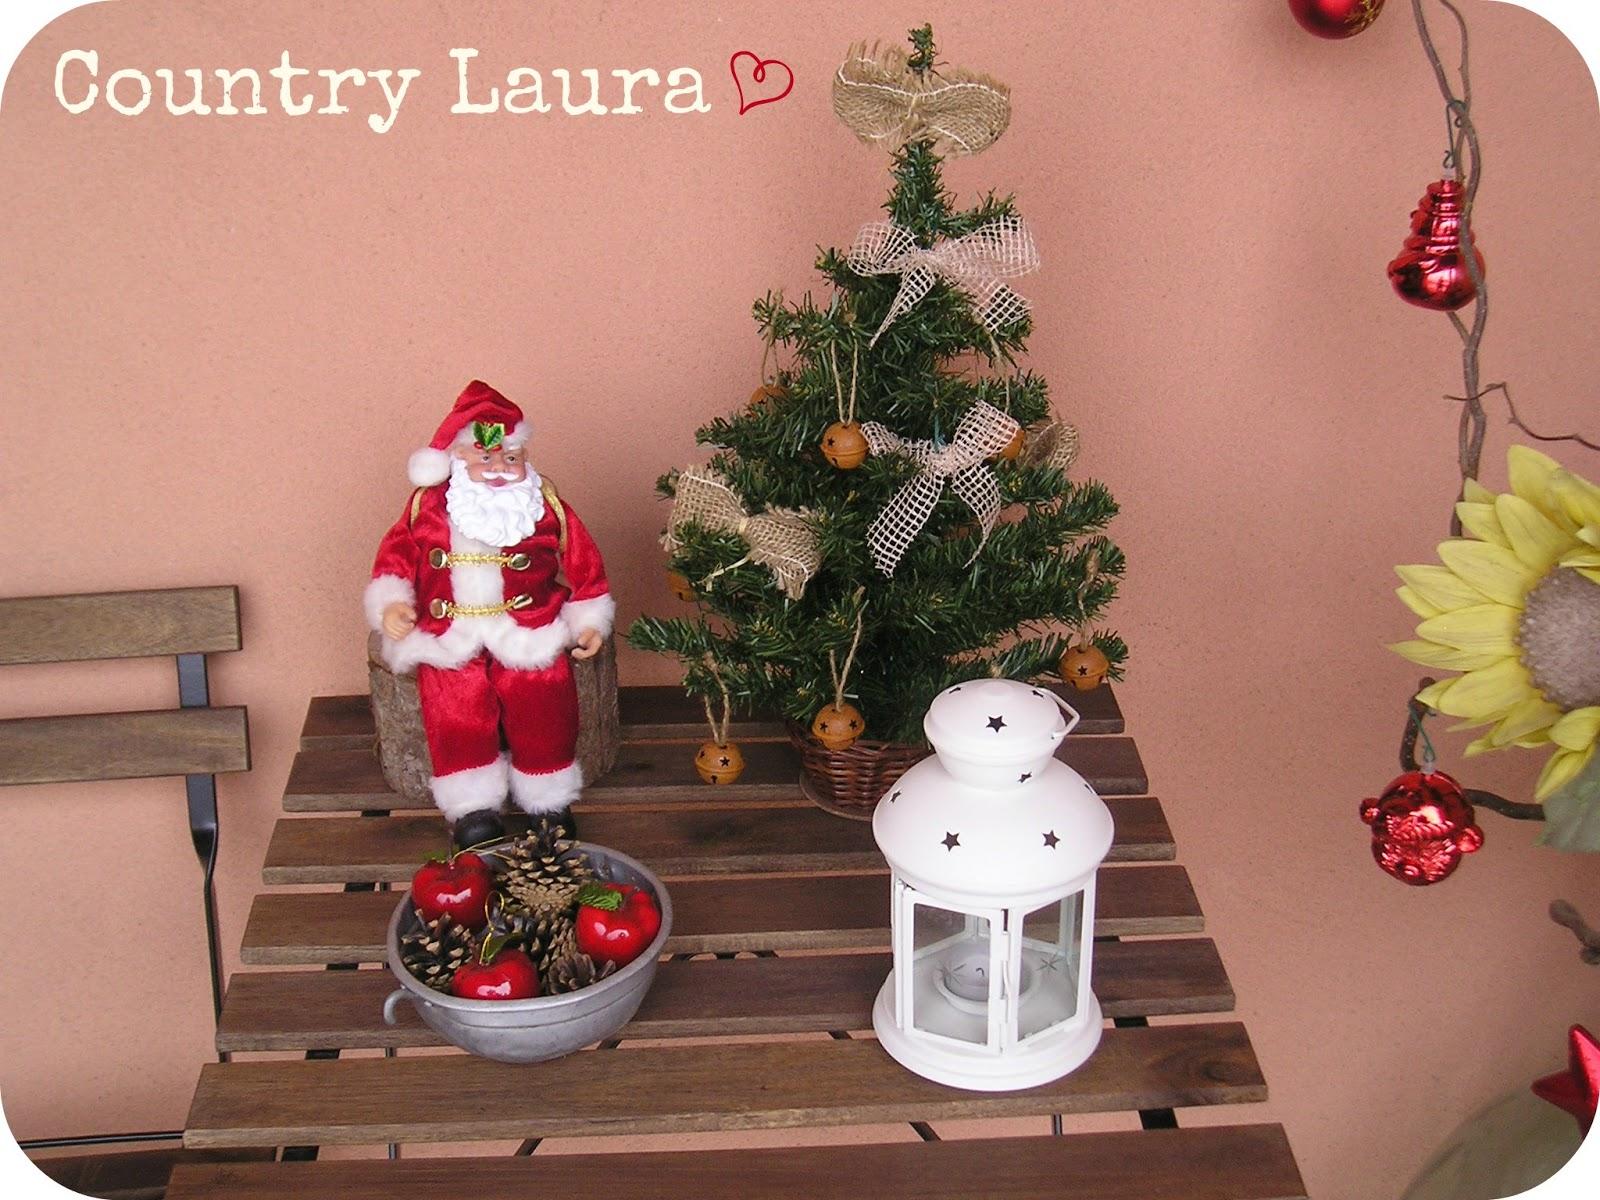 Country laura addobbi natalizi esterni - Addobbi natalizi per esterno ...